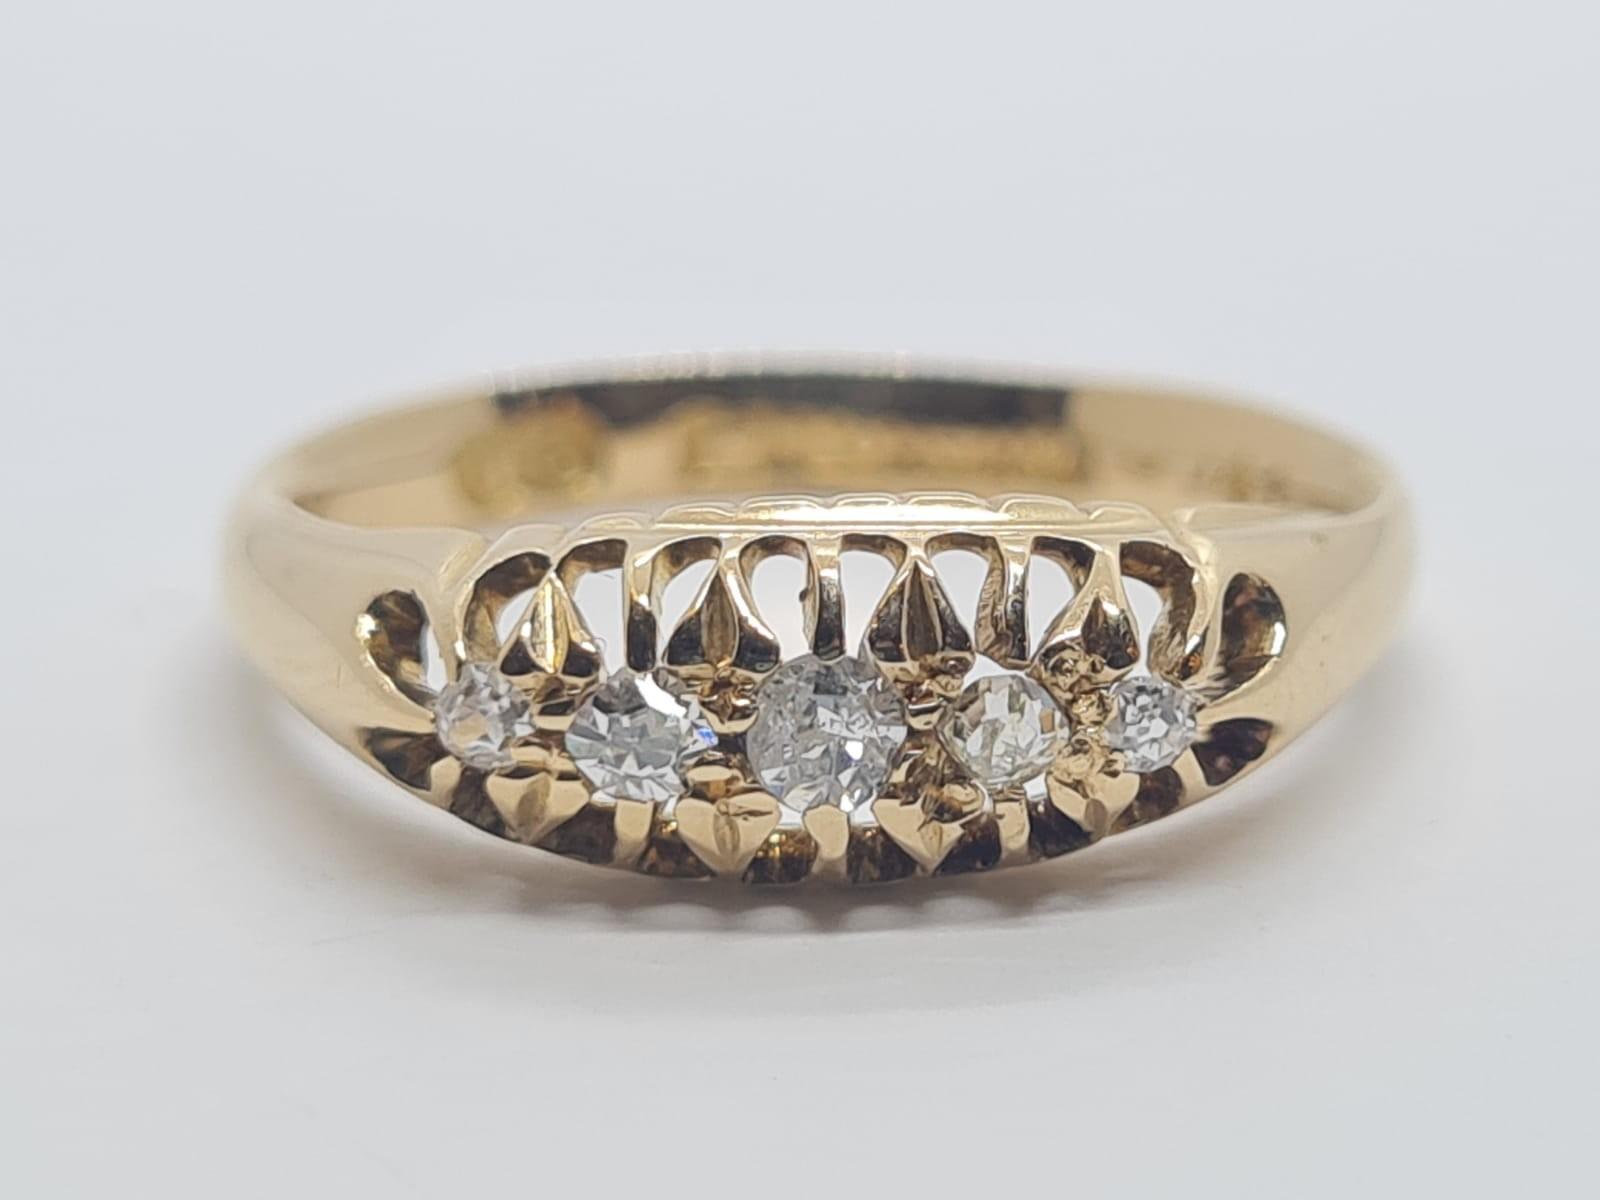 18k Yellow gold vintage DIAMOND 5 STONE SET RING, APPROX 0.15CT DIAMONDS, WEIGHT 2.9g SIZE N